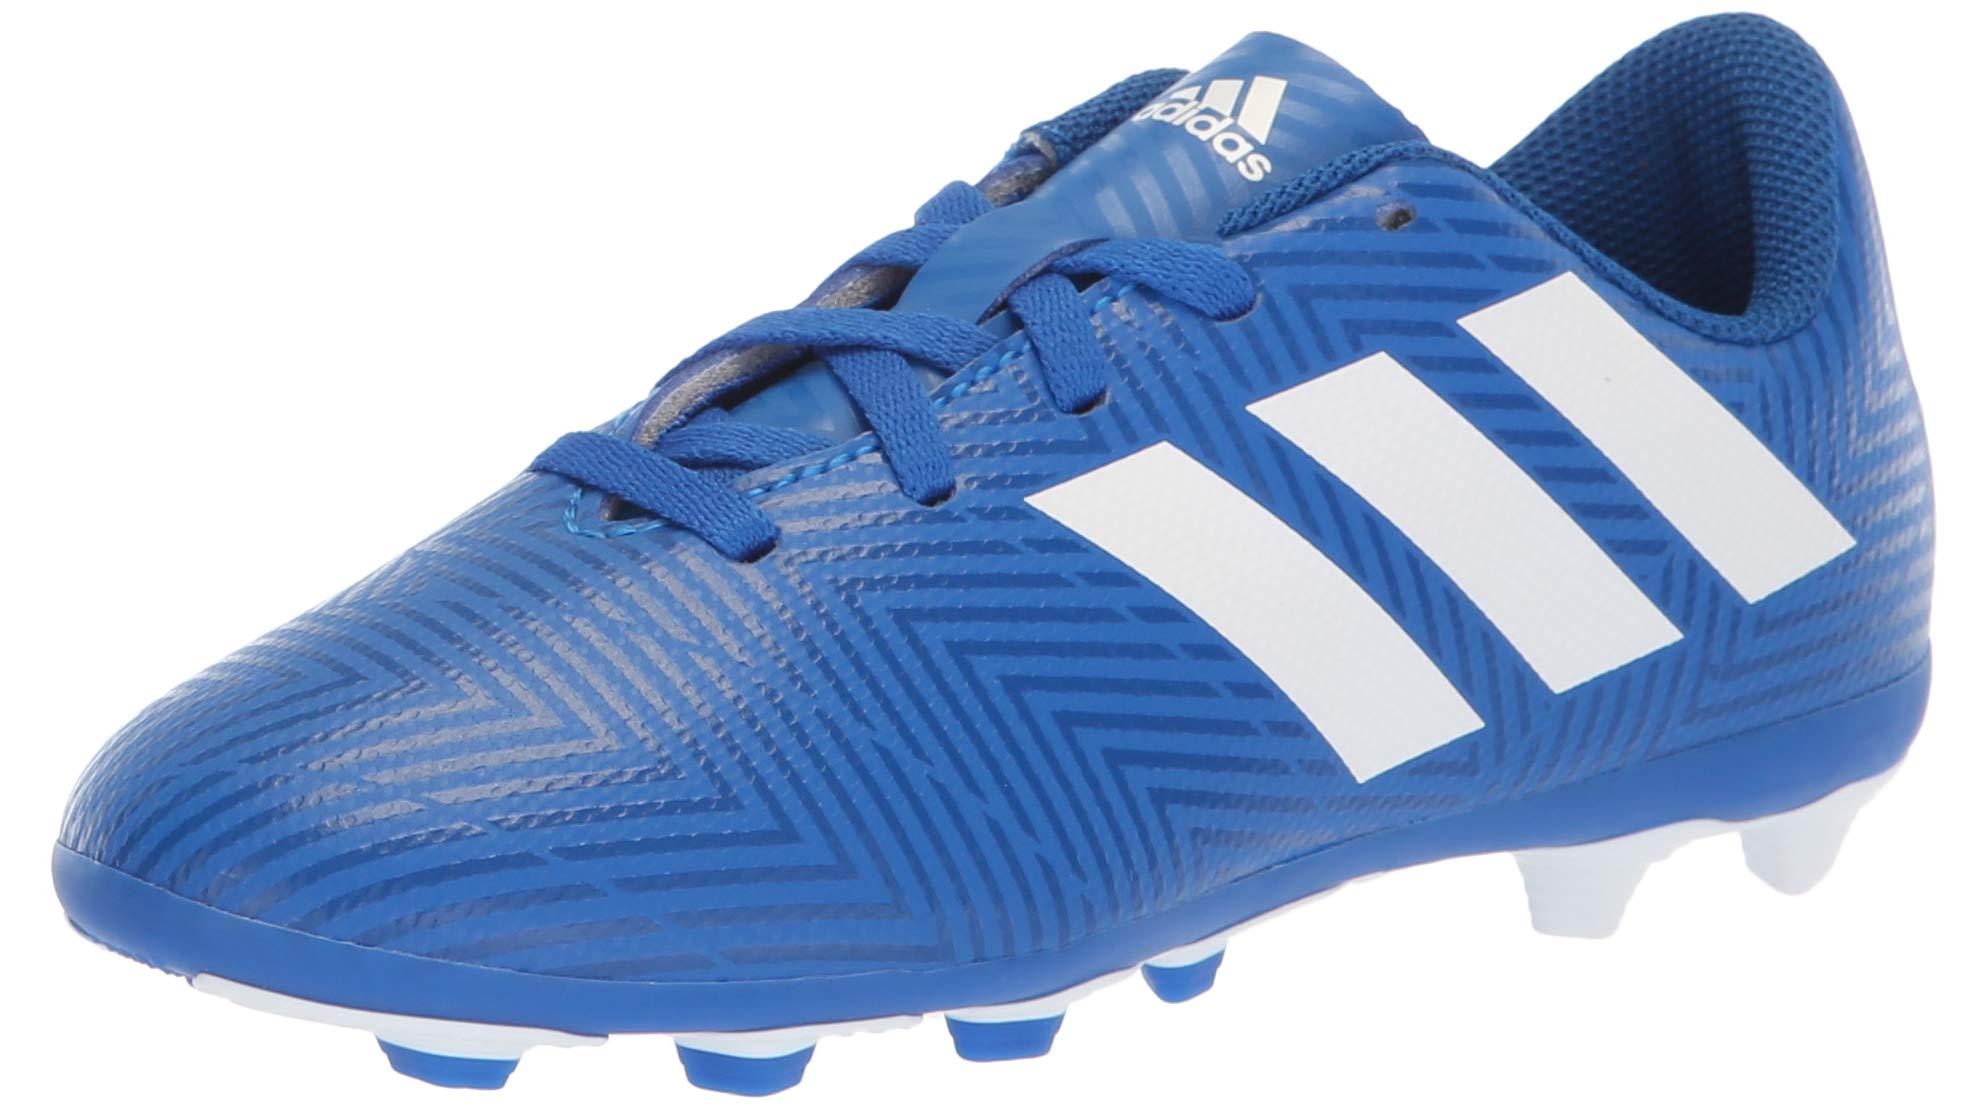 adidas Unisex Nemeziz 18.4 Firm Ground Soccer Shoe, White/Football Blue, 5.5 M US Big Kid